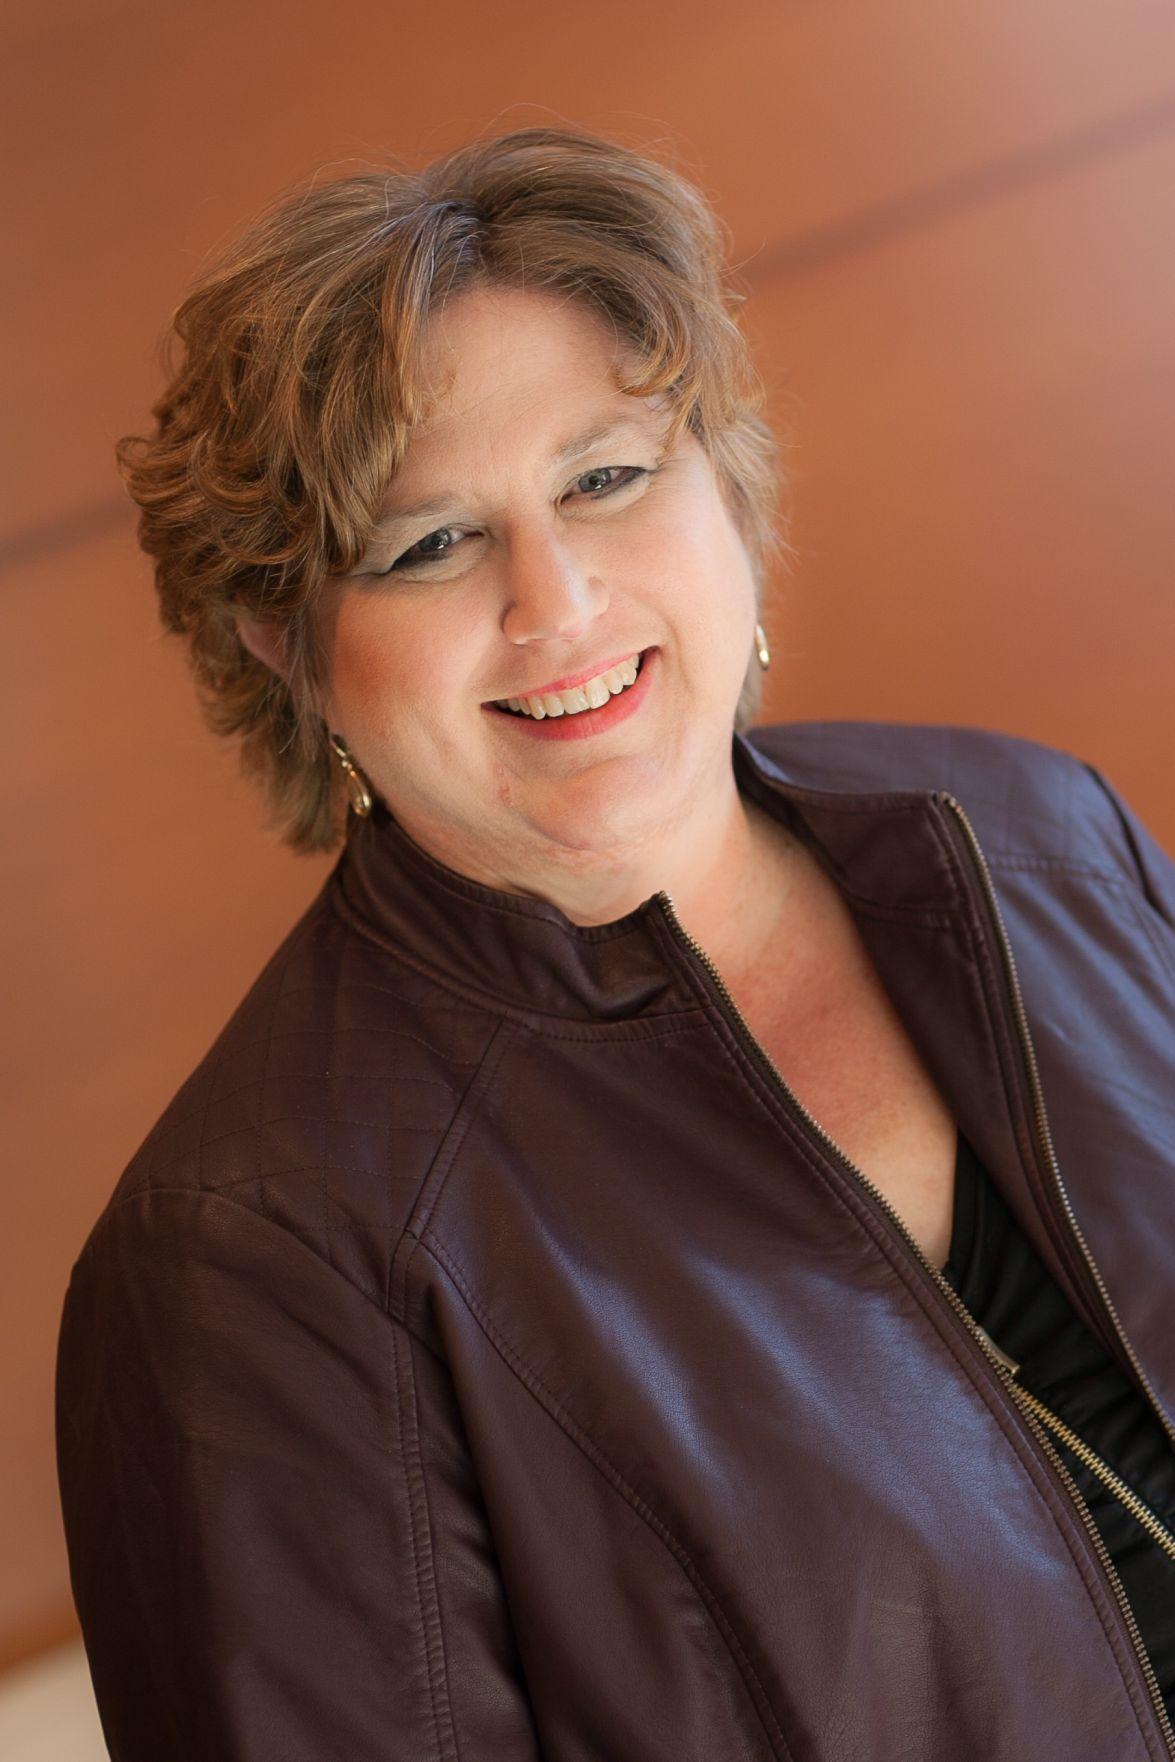 Mary Beth Rathe